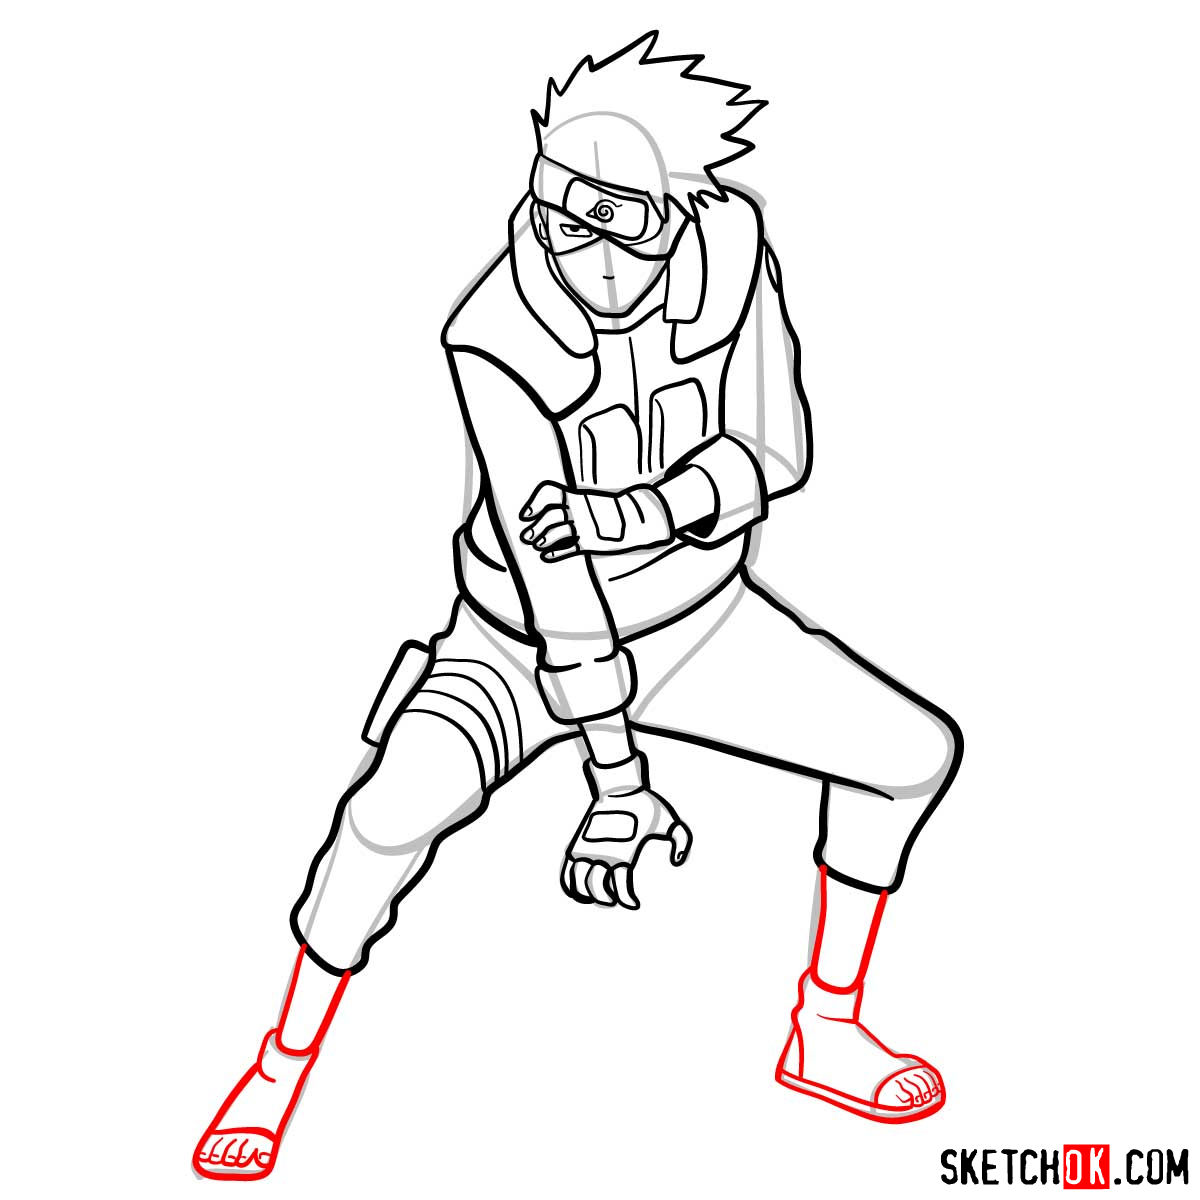 How to draw Kakashi Hatake from Naruto anime - step 13